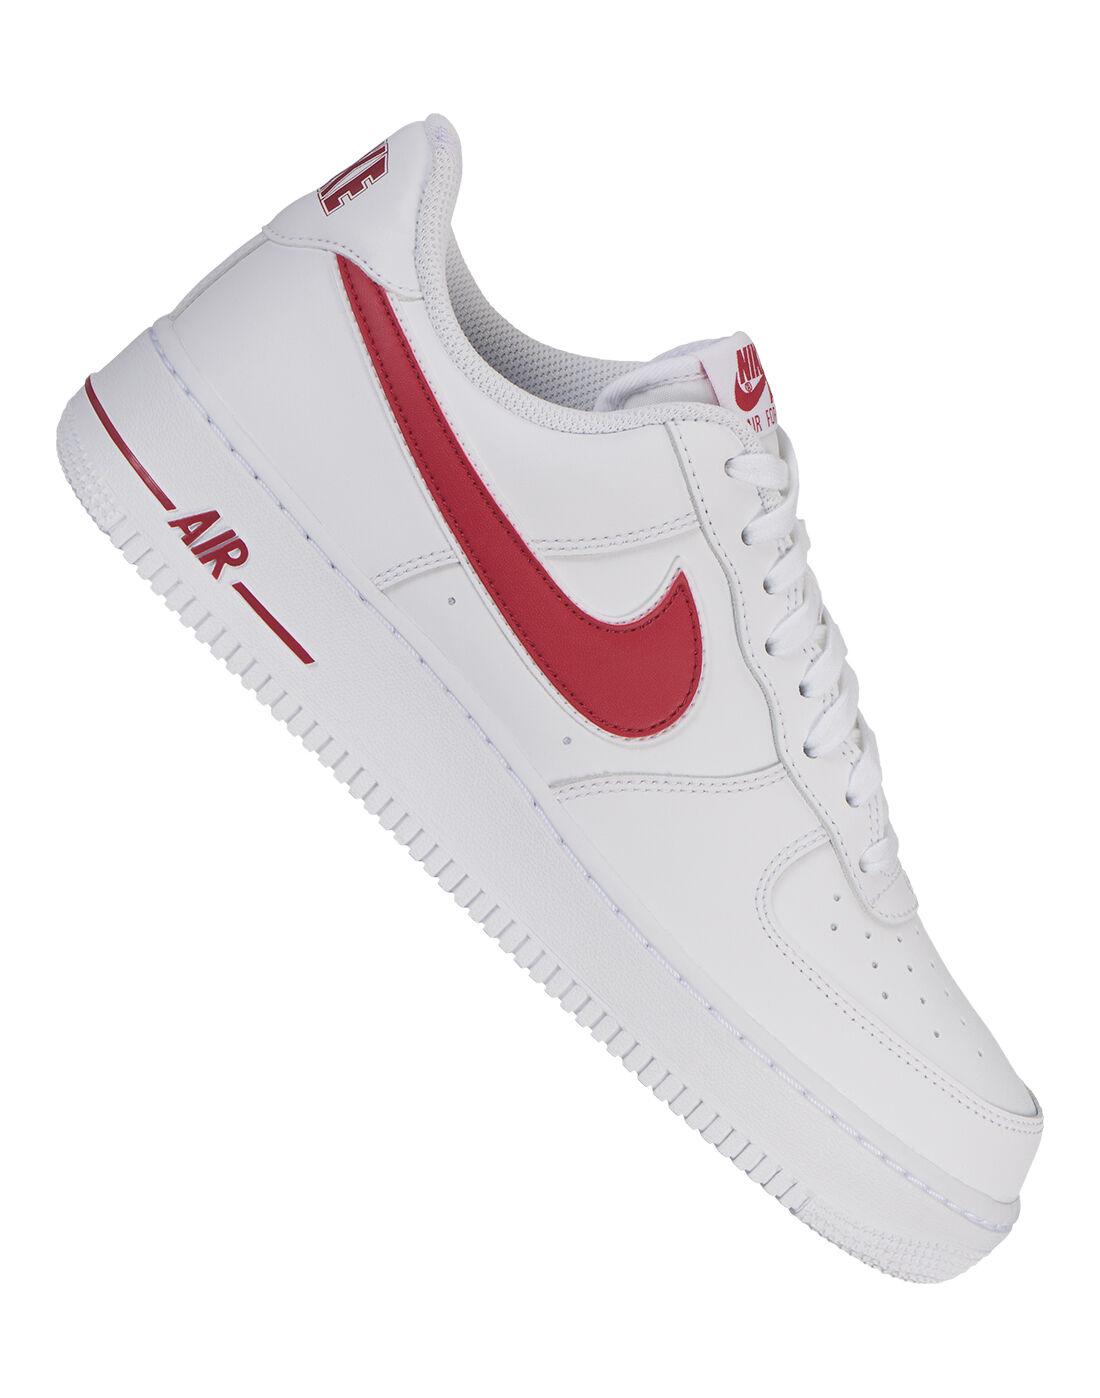 Men's White \u0026 Red Nike Air Force 1